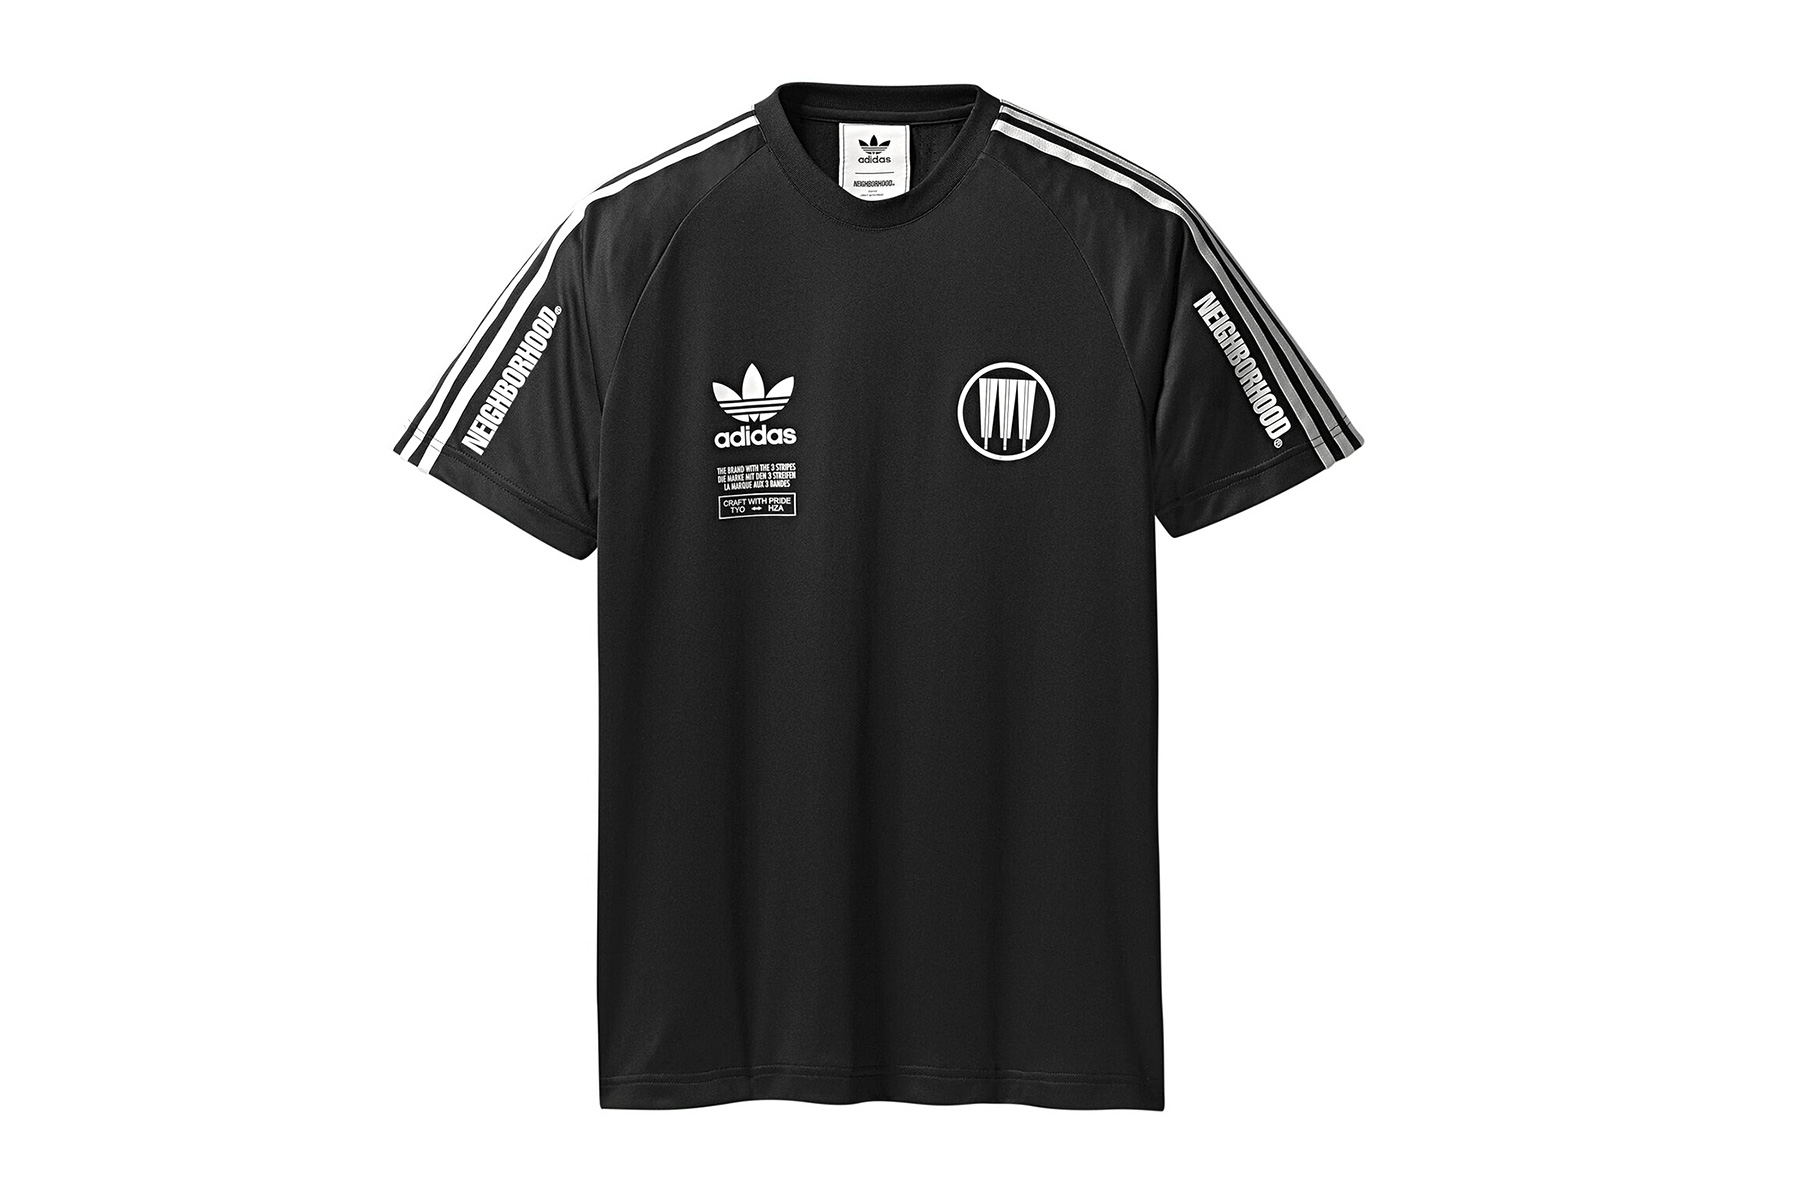 adidas black jersey